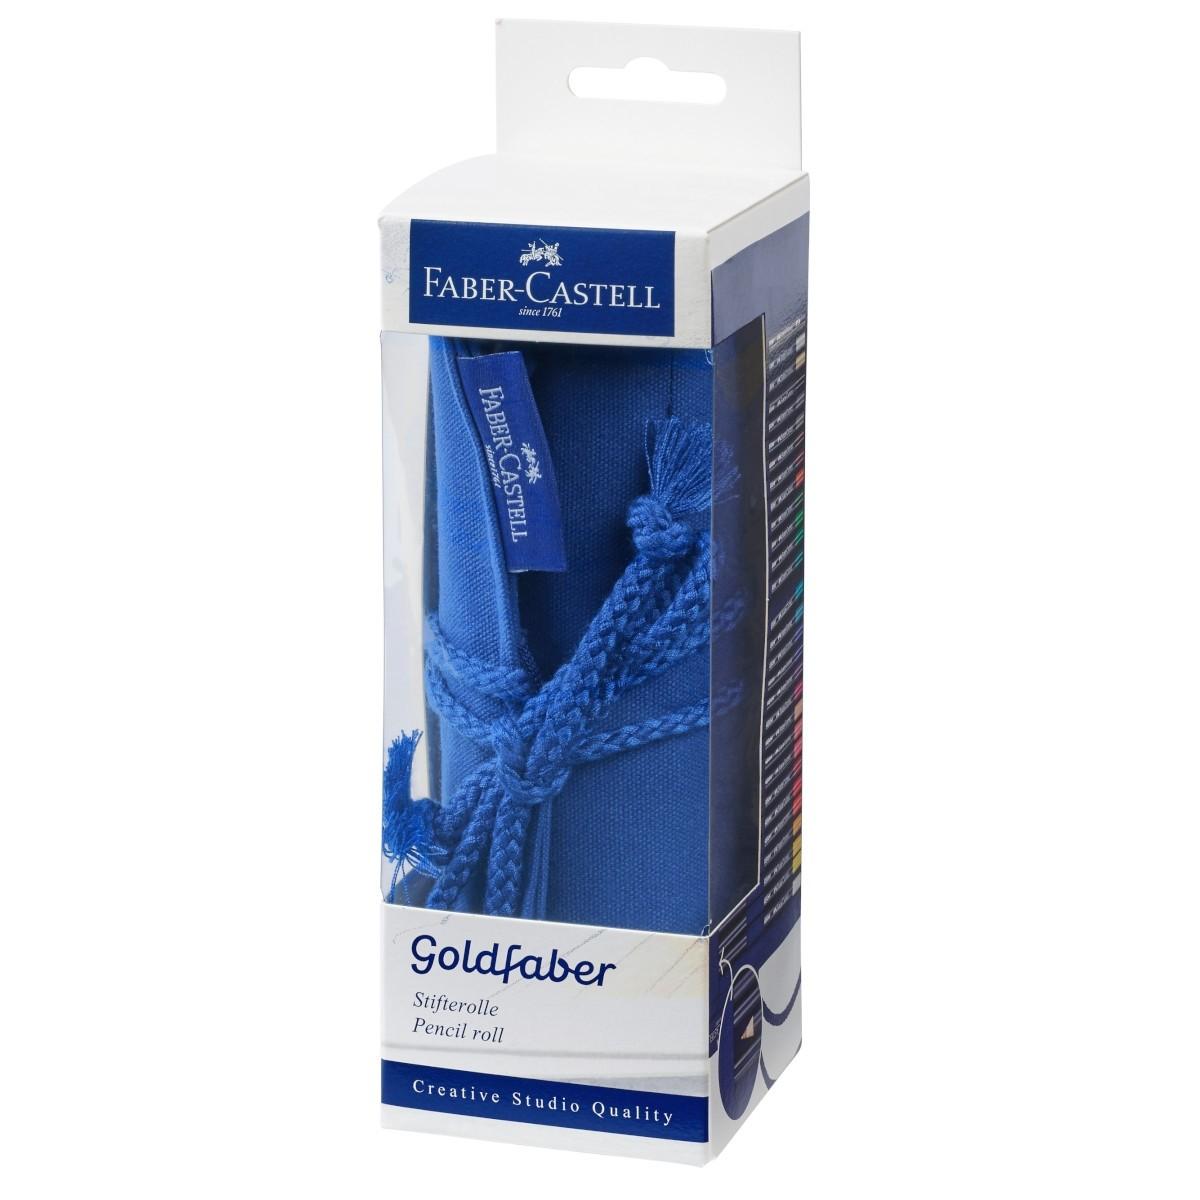 FaberCastellGoldfarber27stkfarveblyanteripenalhus2Bblyantogspidser-01